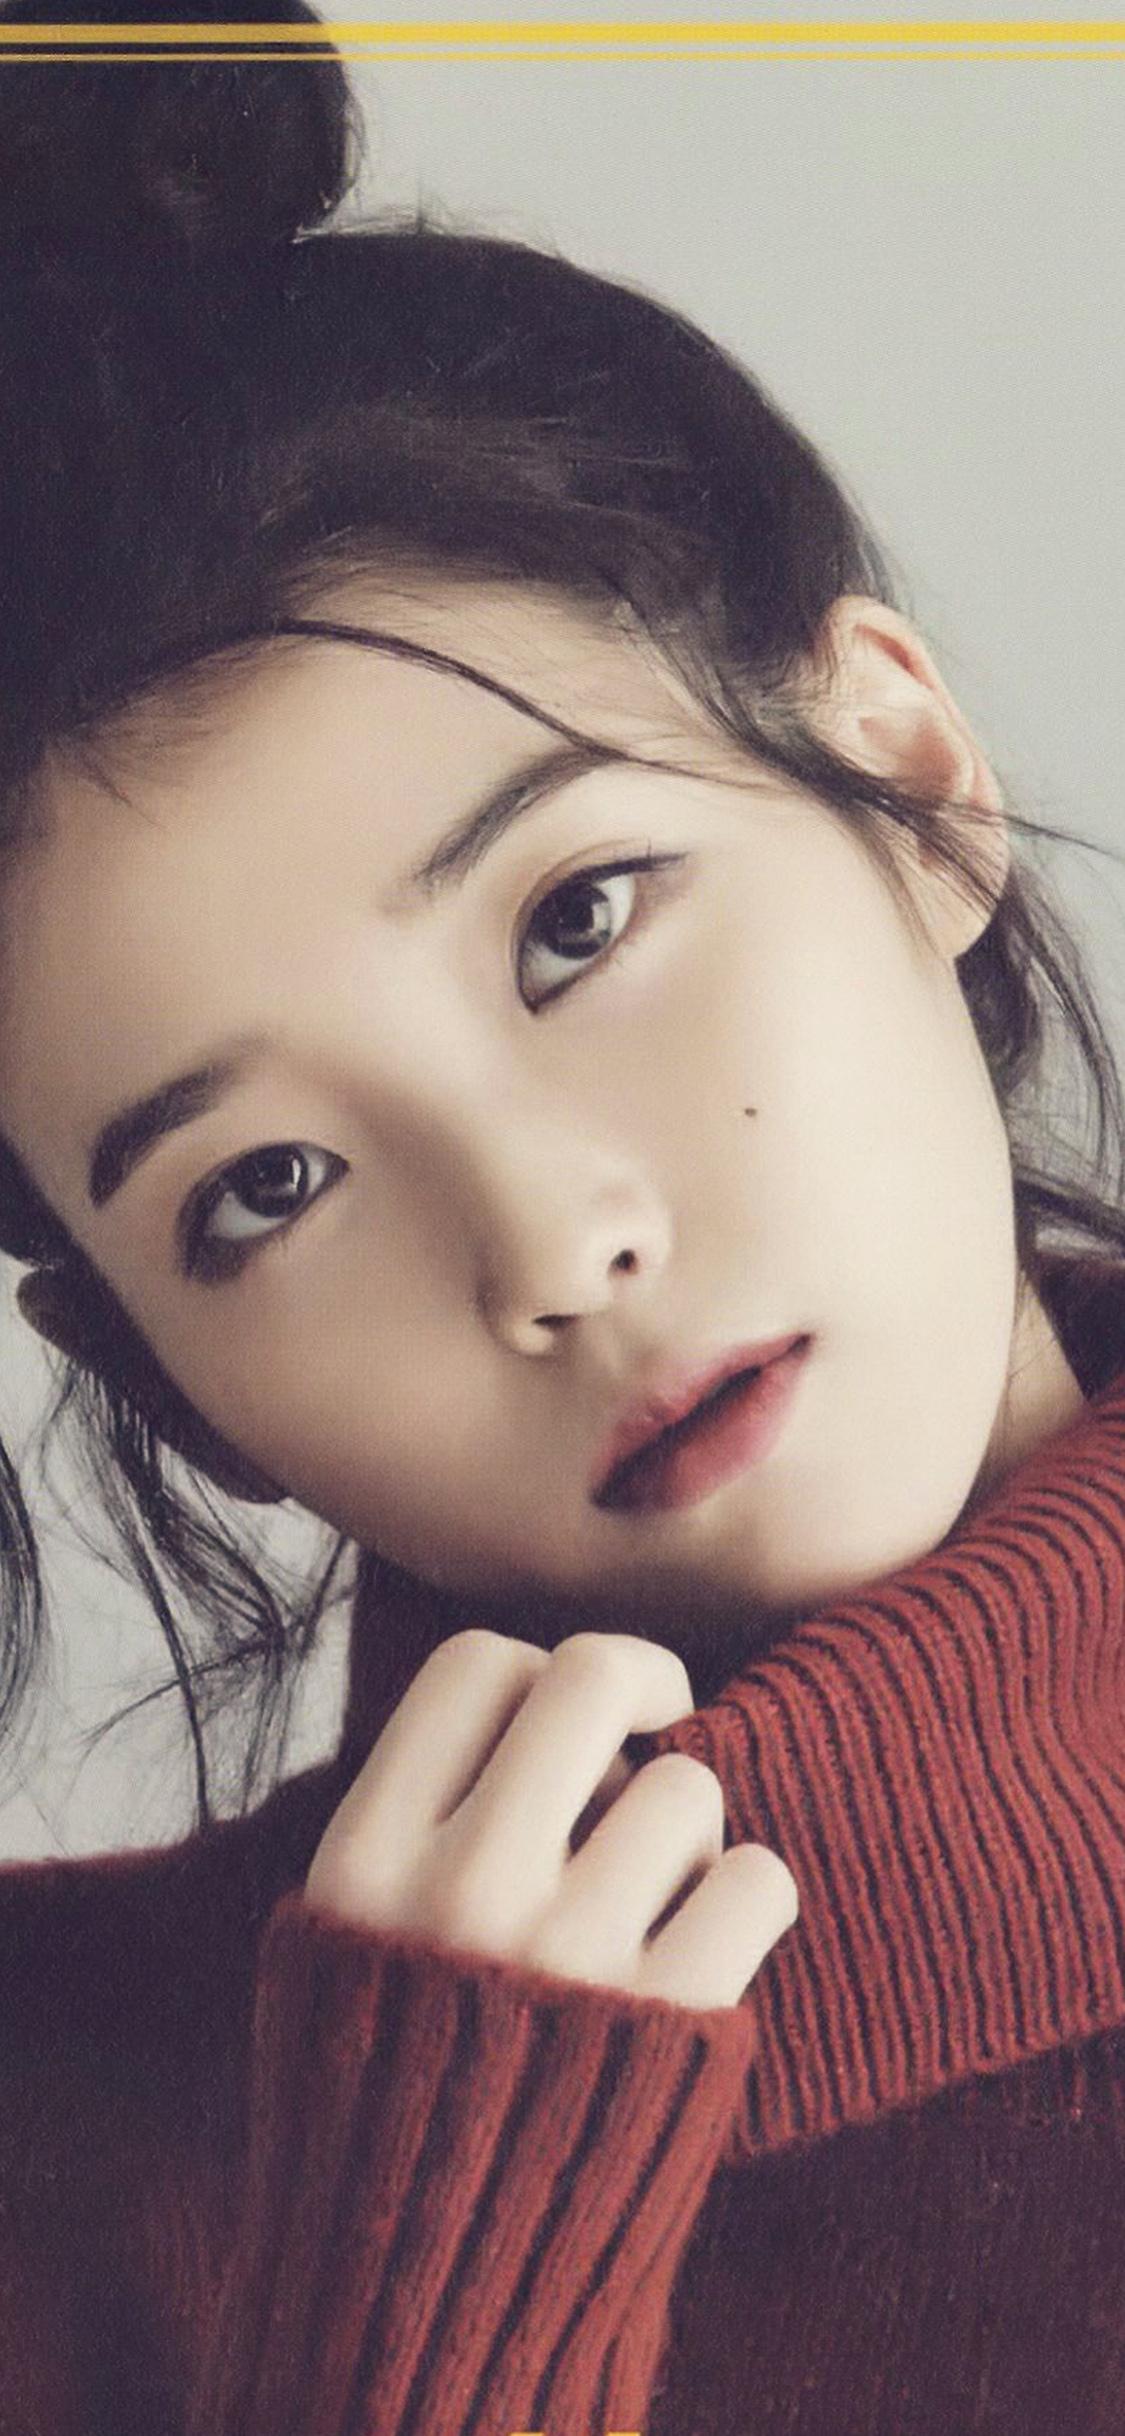 iPhoneXpapers.com-Apple-iPhone-wallpaper-hn83-iu-kpop-girl-singer-artist-cute